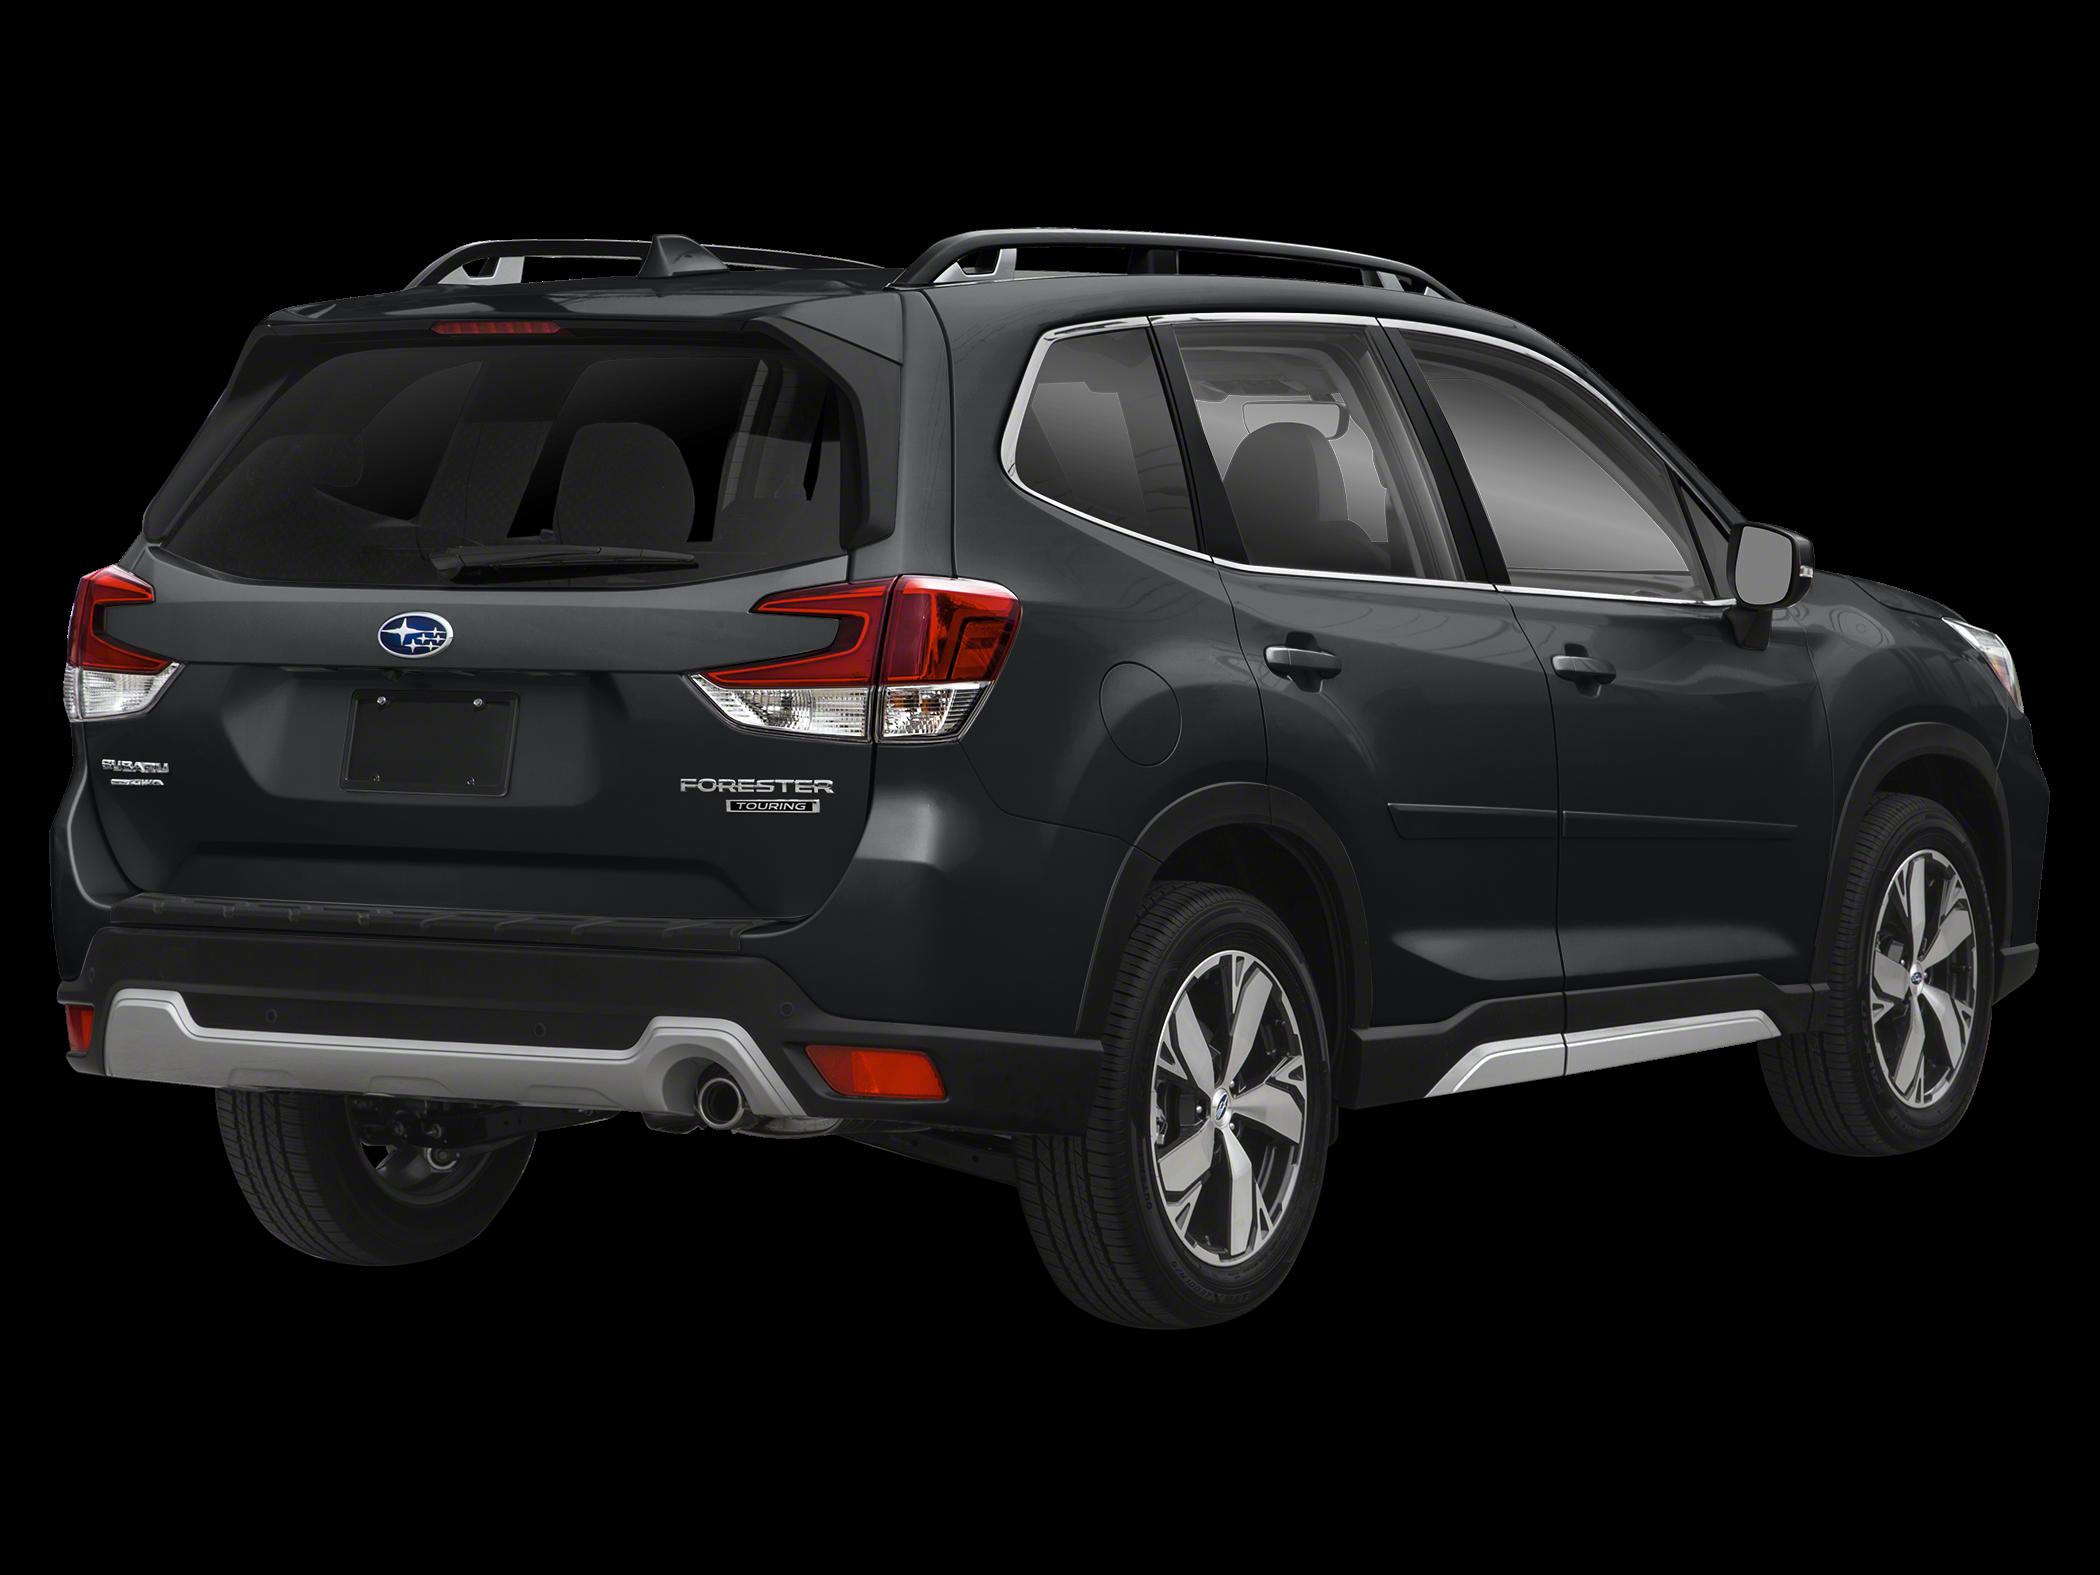 2020 Subaru Forester Premier : Price, Specs & Review ...